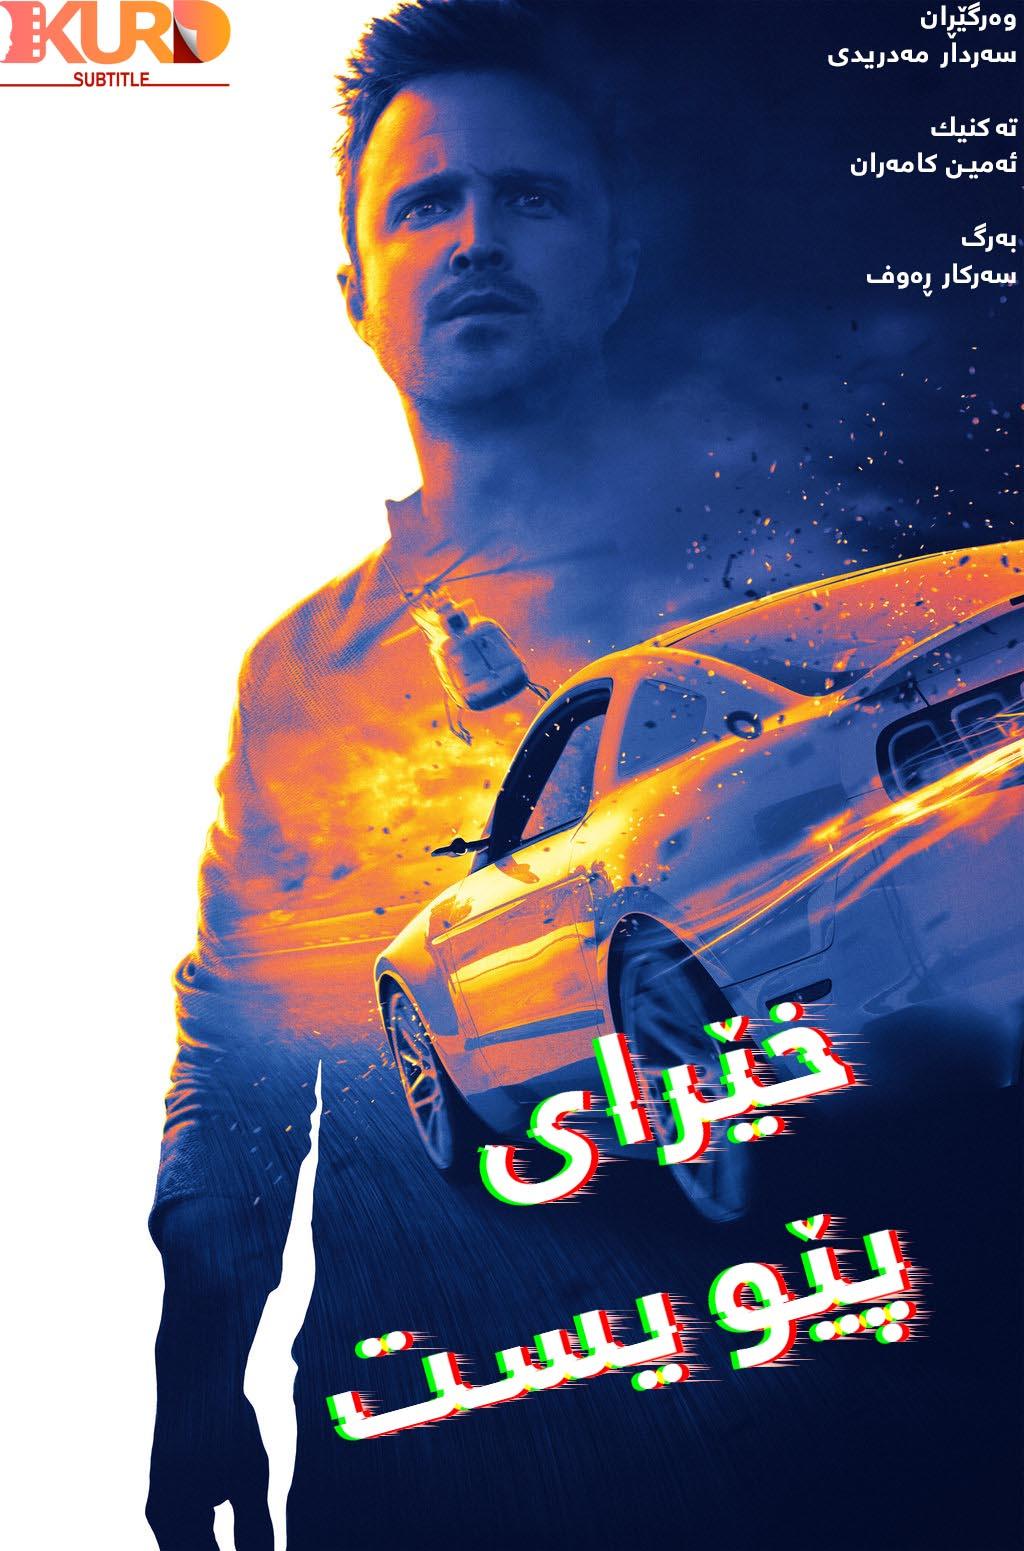 Need for Speed kurdish poster